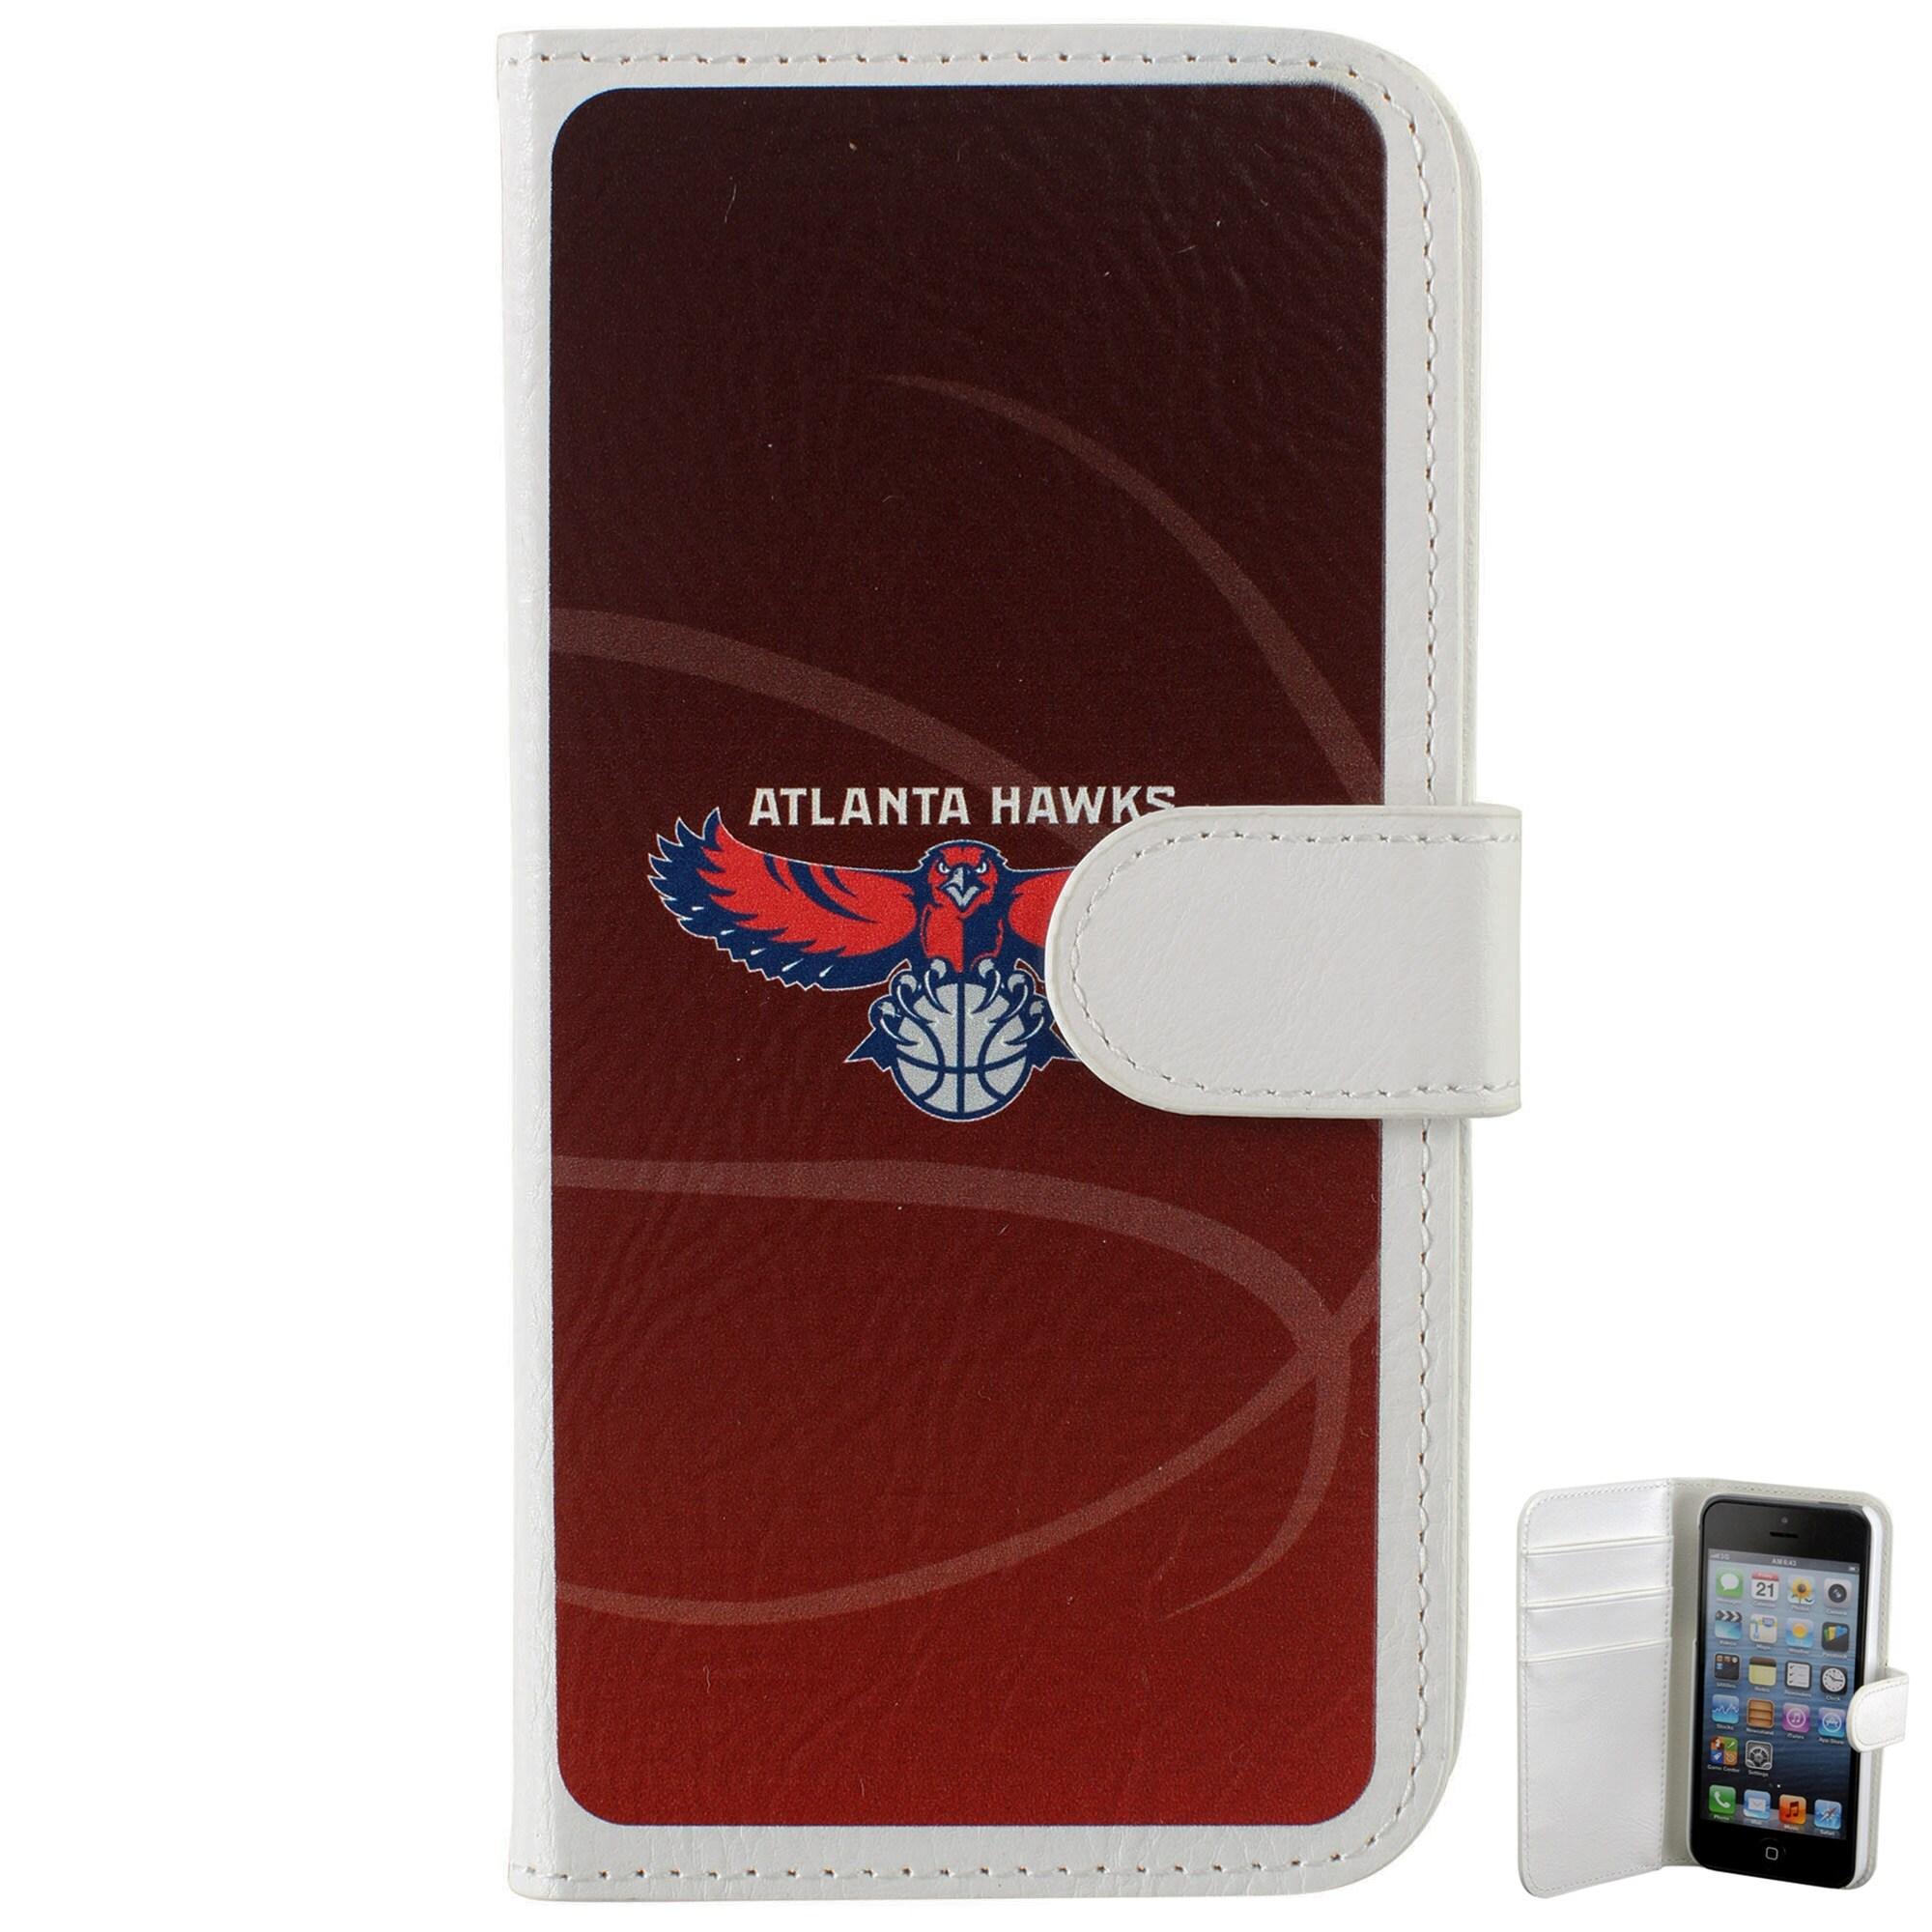 Atlanta Hawks Basketball iPhone 5 Wallet